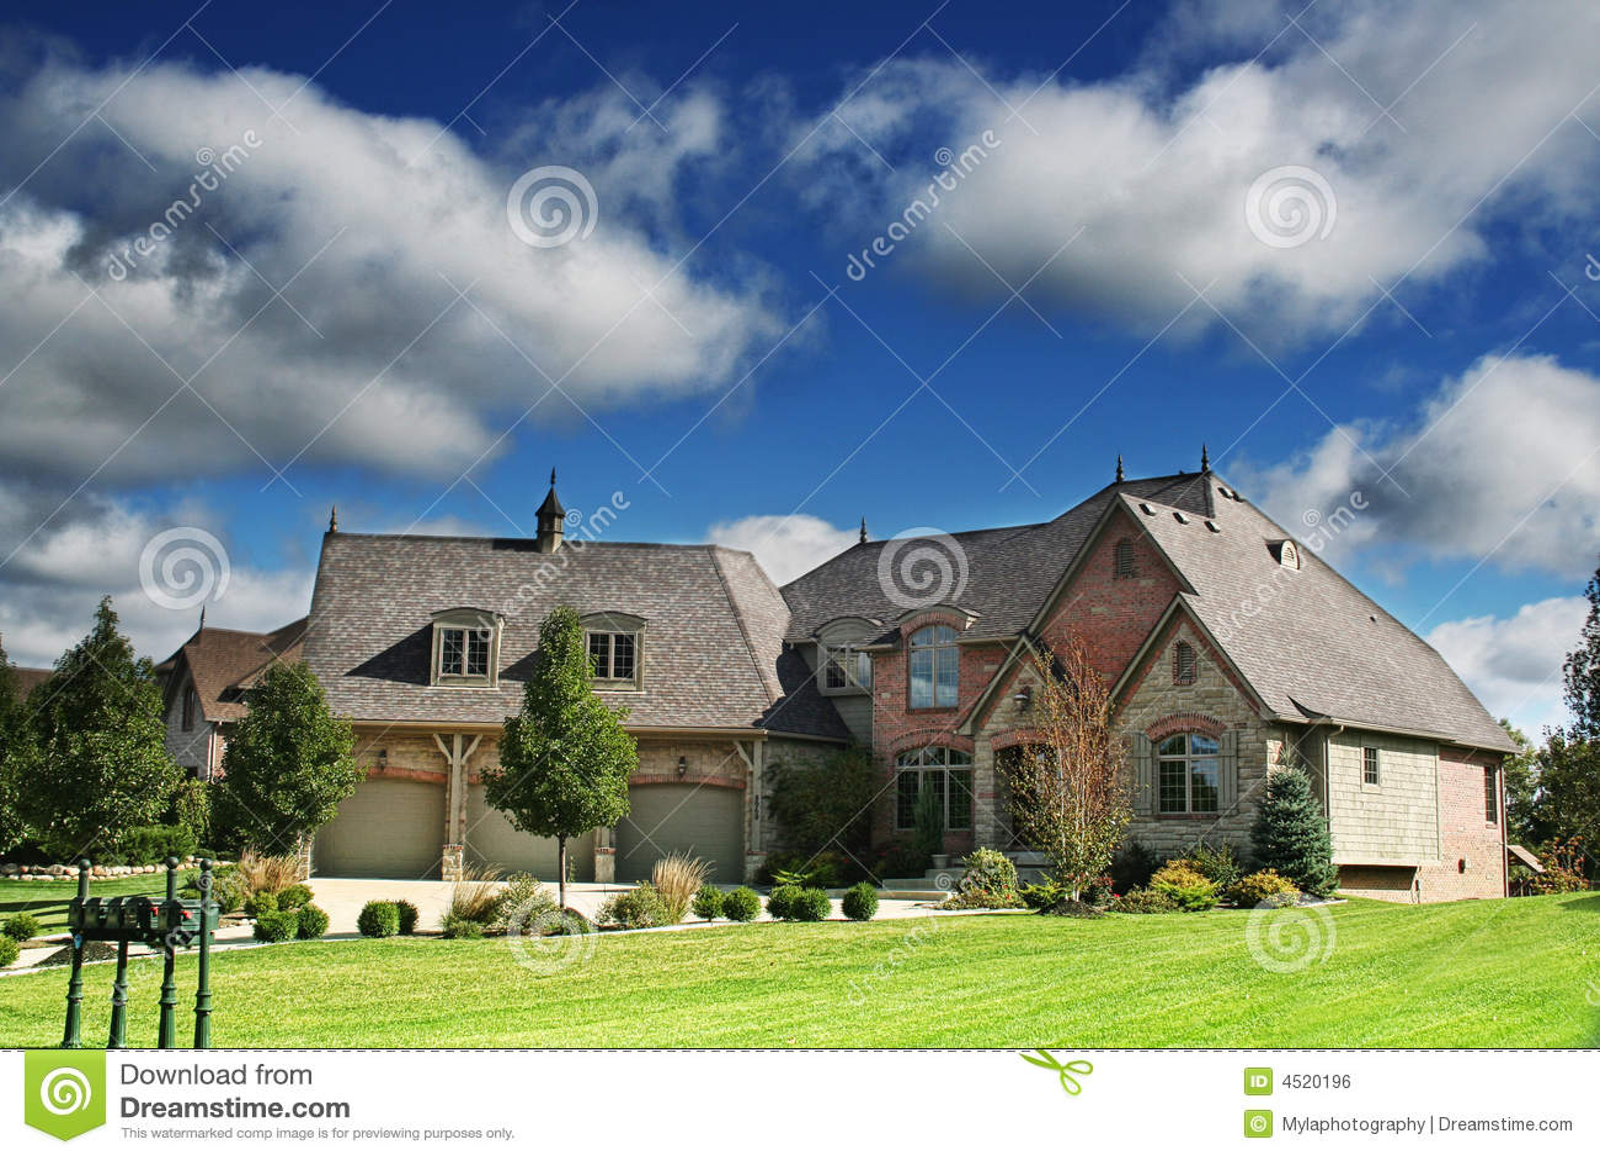 Houses in hamlet1